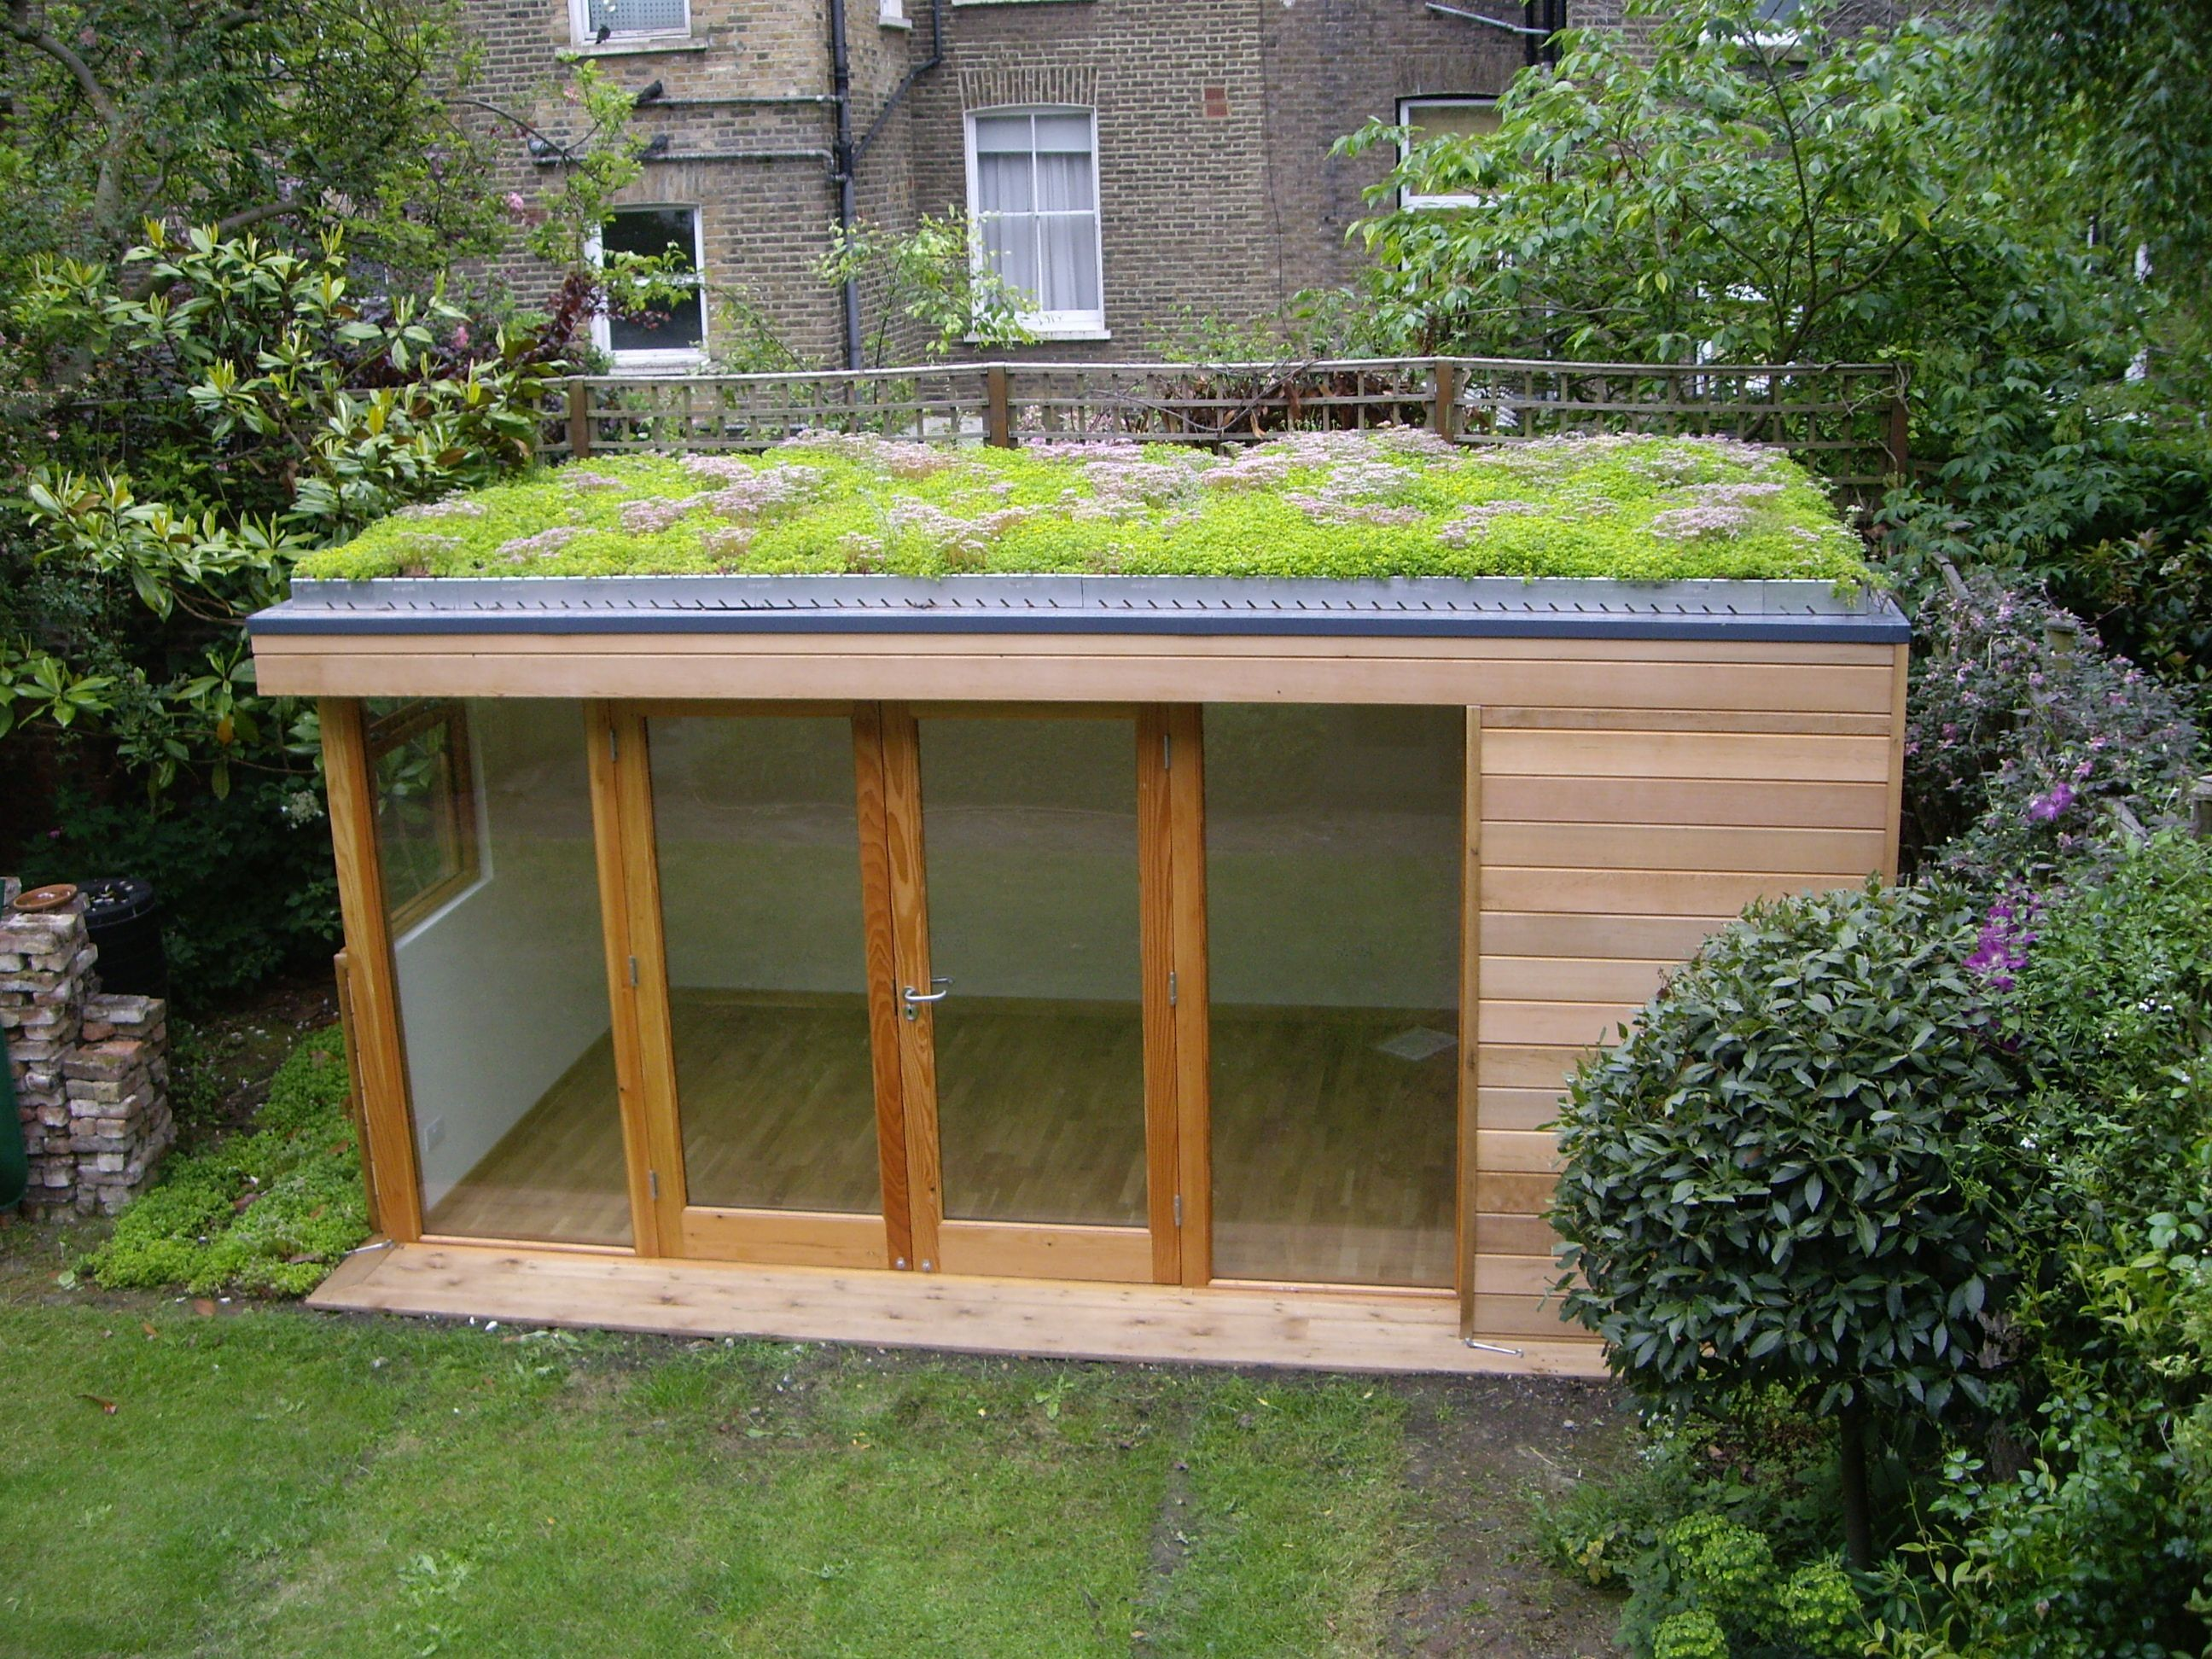 4 Pleasing Tips Interesting Roofing Design Shed Roofing Interior Circular Roofing Design Roofing Ideas Squ